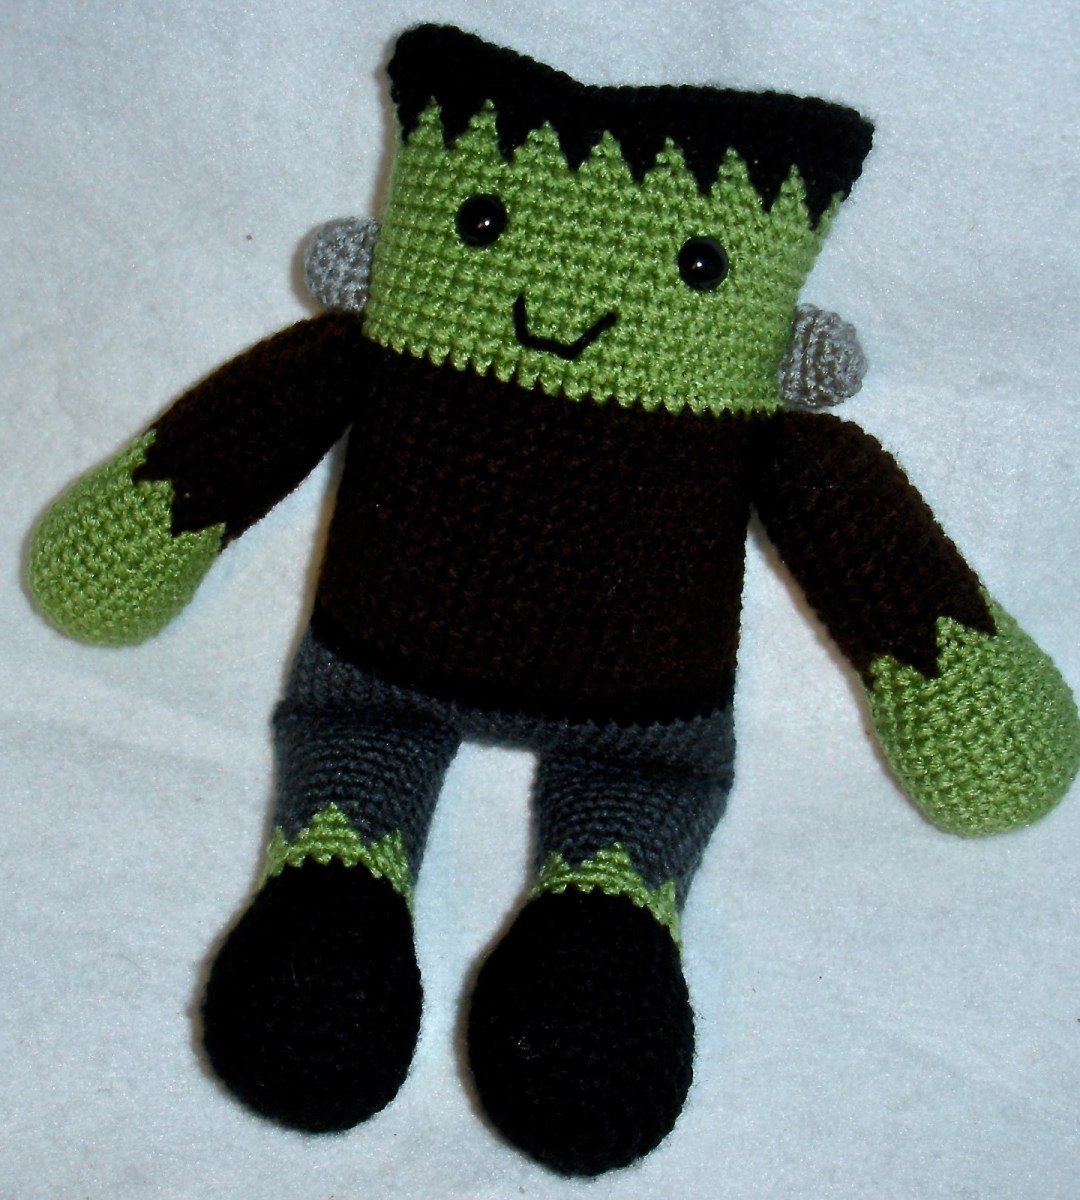 Quick Large Crochet Doll Patterns to Choose Frankenstein Doll Amigurumi Crochet Pattern Amigurumi Free